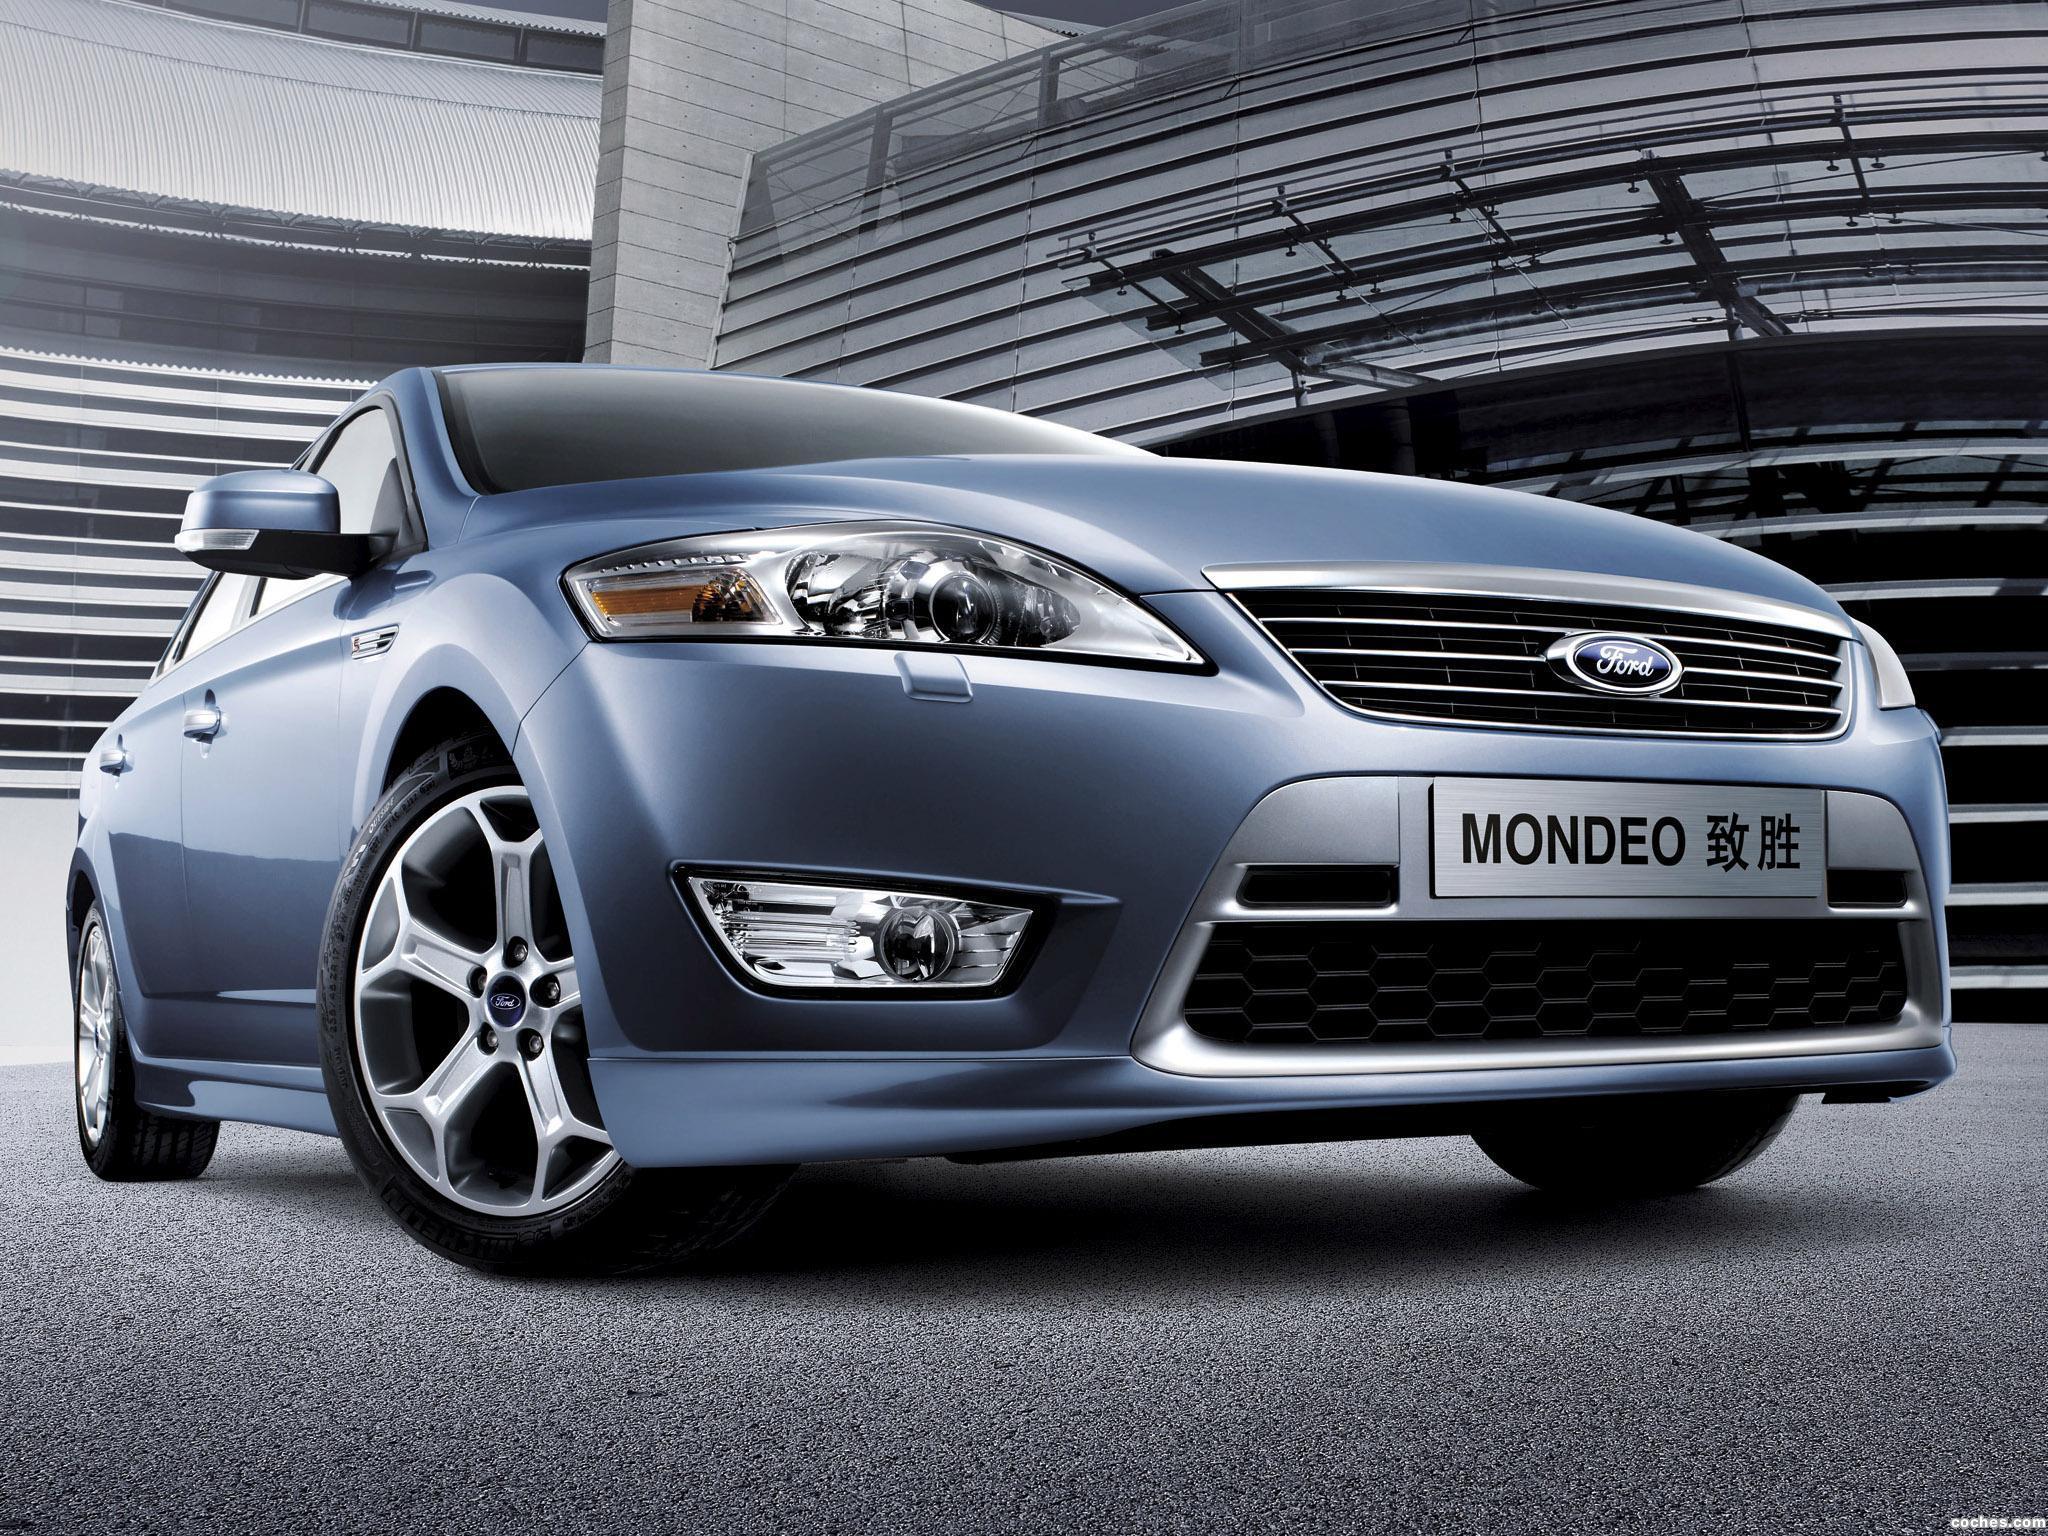 Foto 0 de Ford Mondeo China 2010